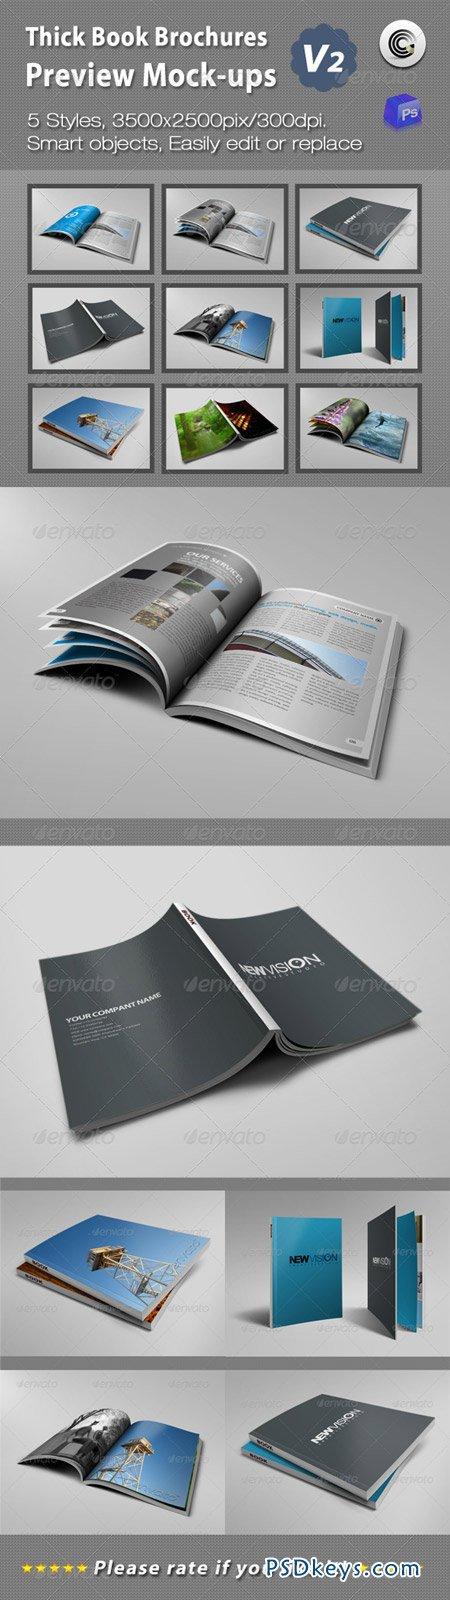 Thick Book Brochures Preview Mock-Ups V2 1866029